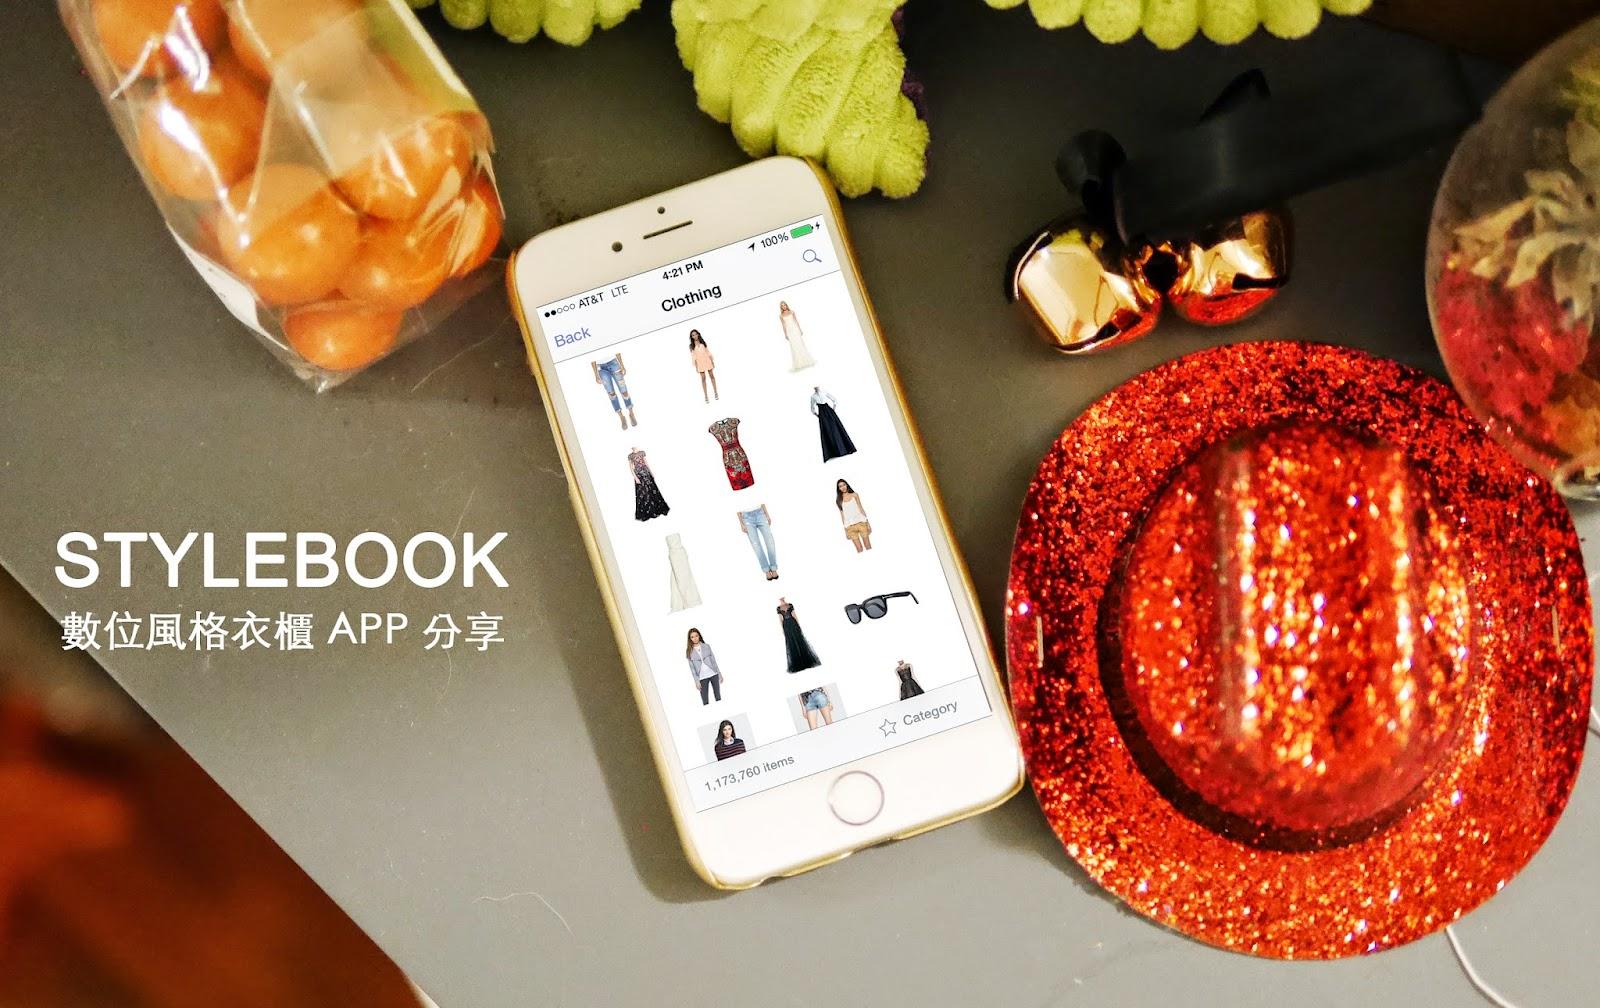 App 軟體分享] Stylebook 把衣櫃放進手機裡, 輕鬆管理穿搭風格